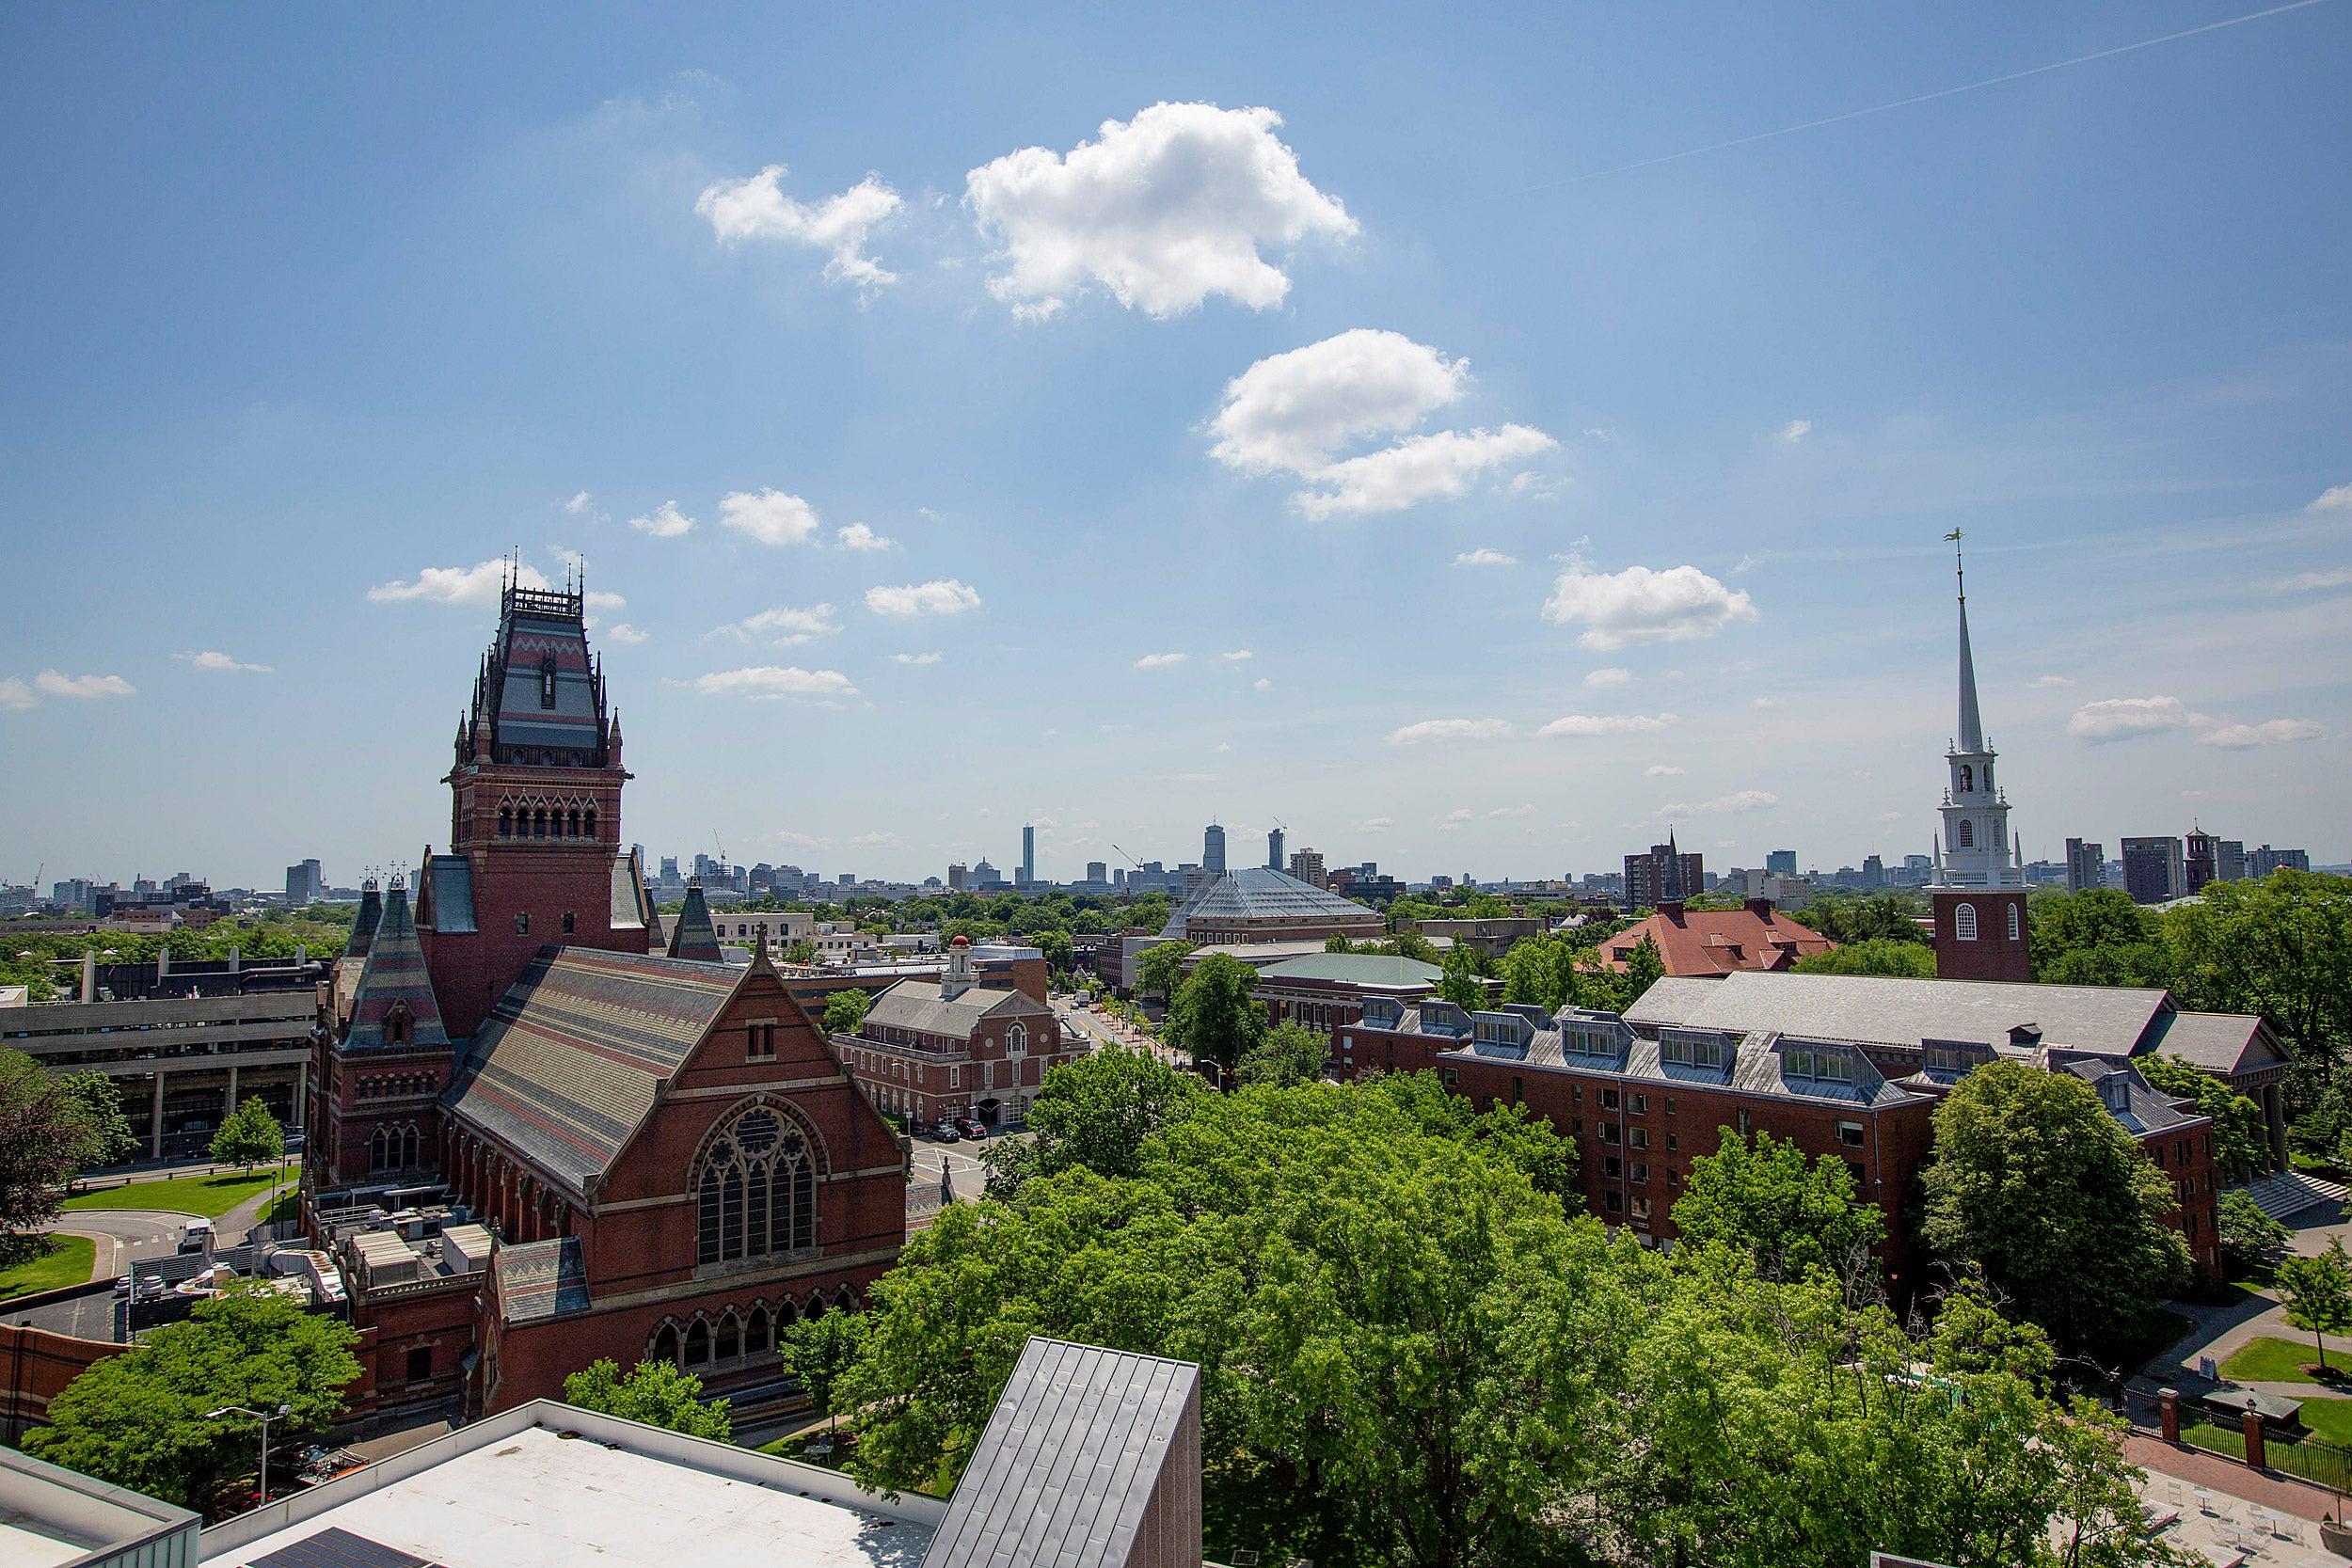 Overhead view of Harvard campus.